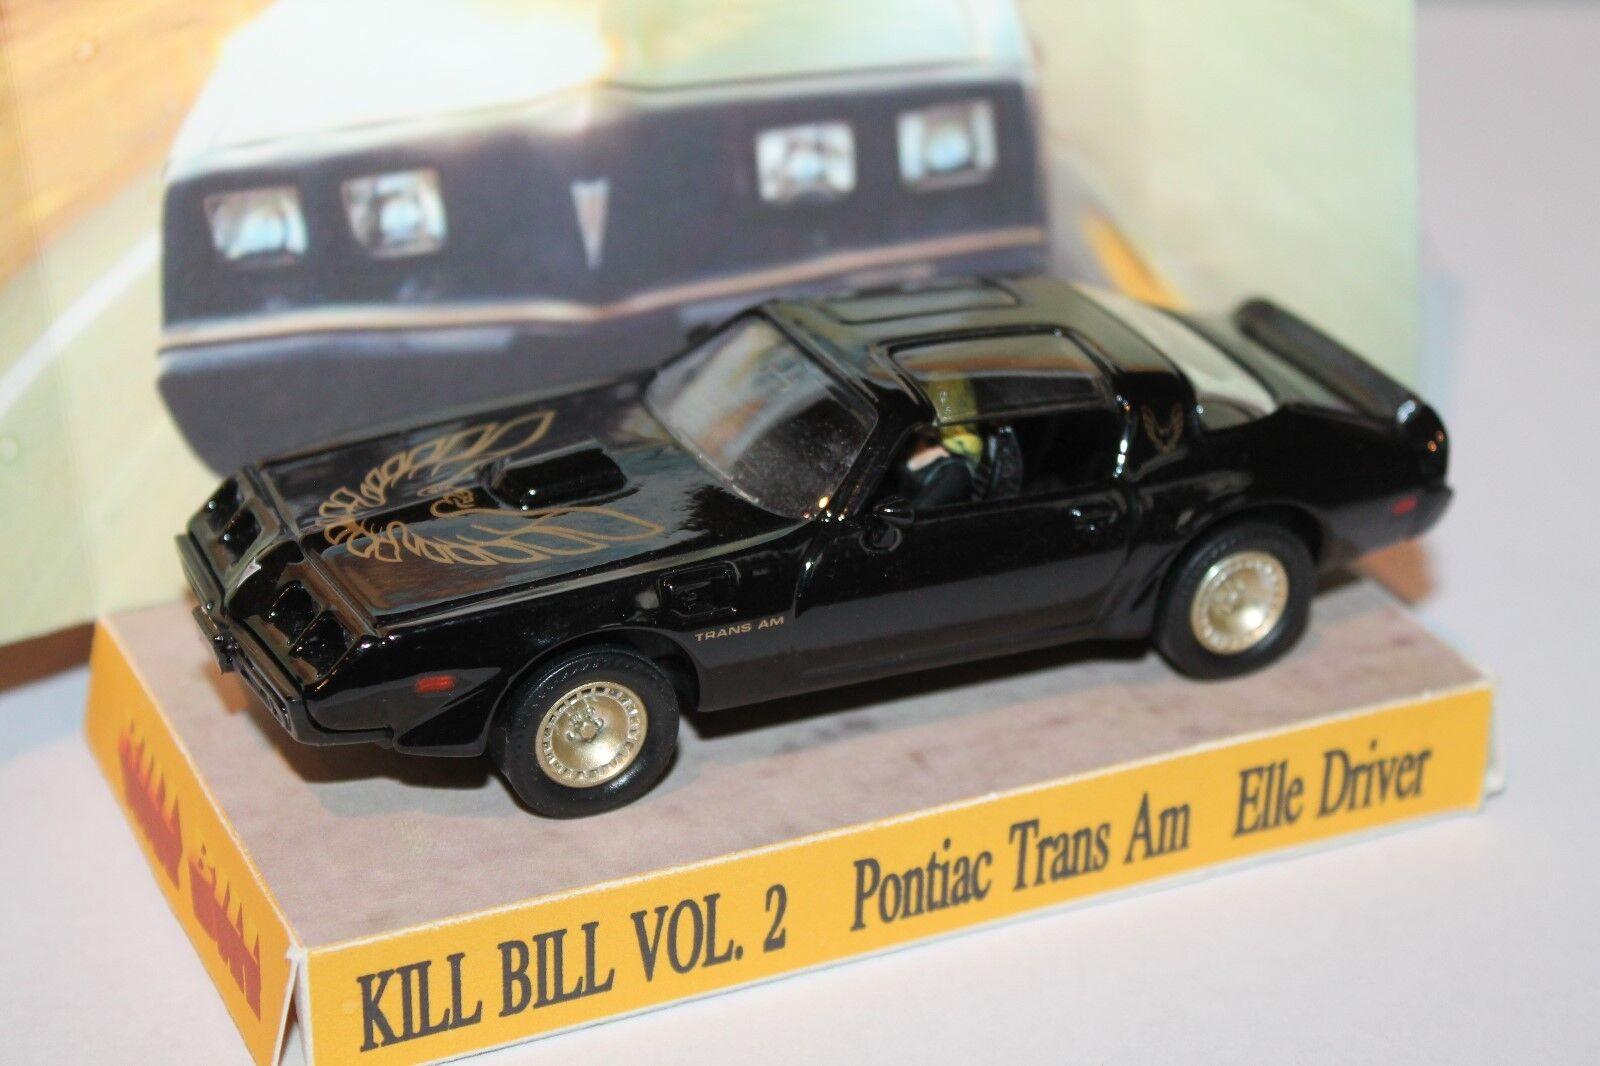 KILL BILL 2  PONTIAC TRANS AM  ELLE DRIVER  CODE 3   UNIKAT  | Vielfältiges neues Design